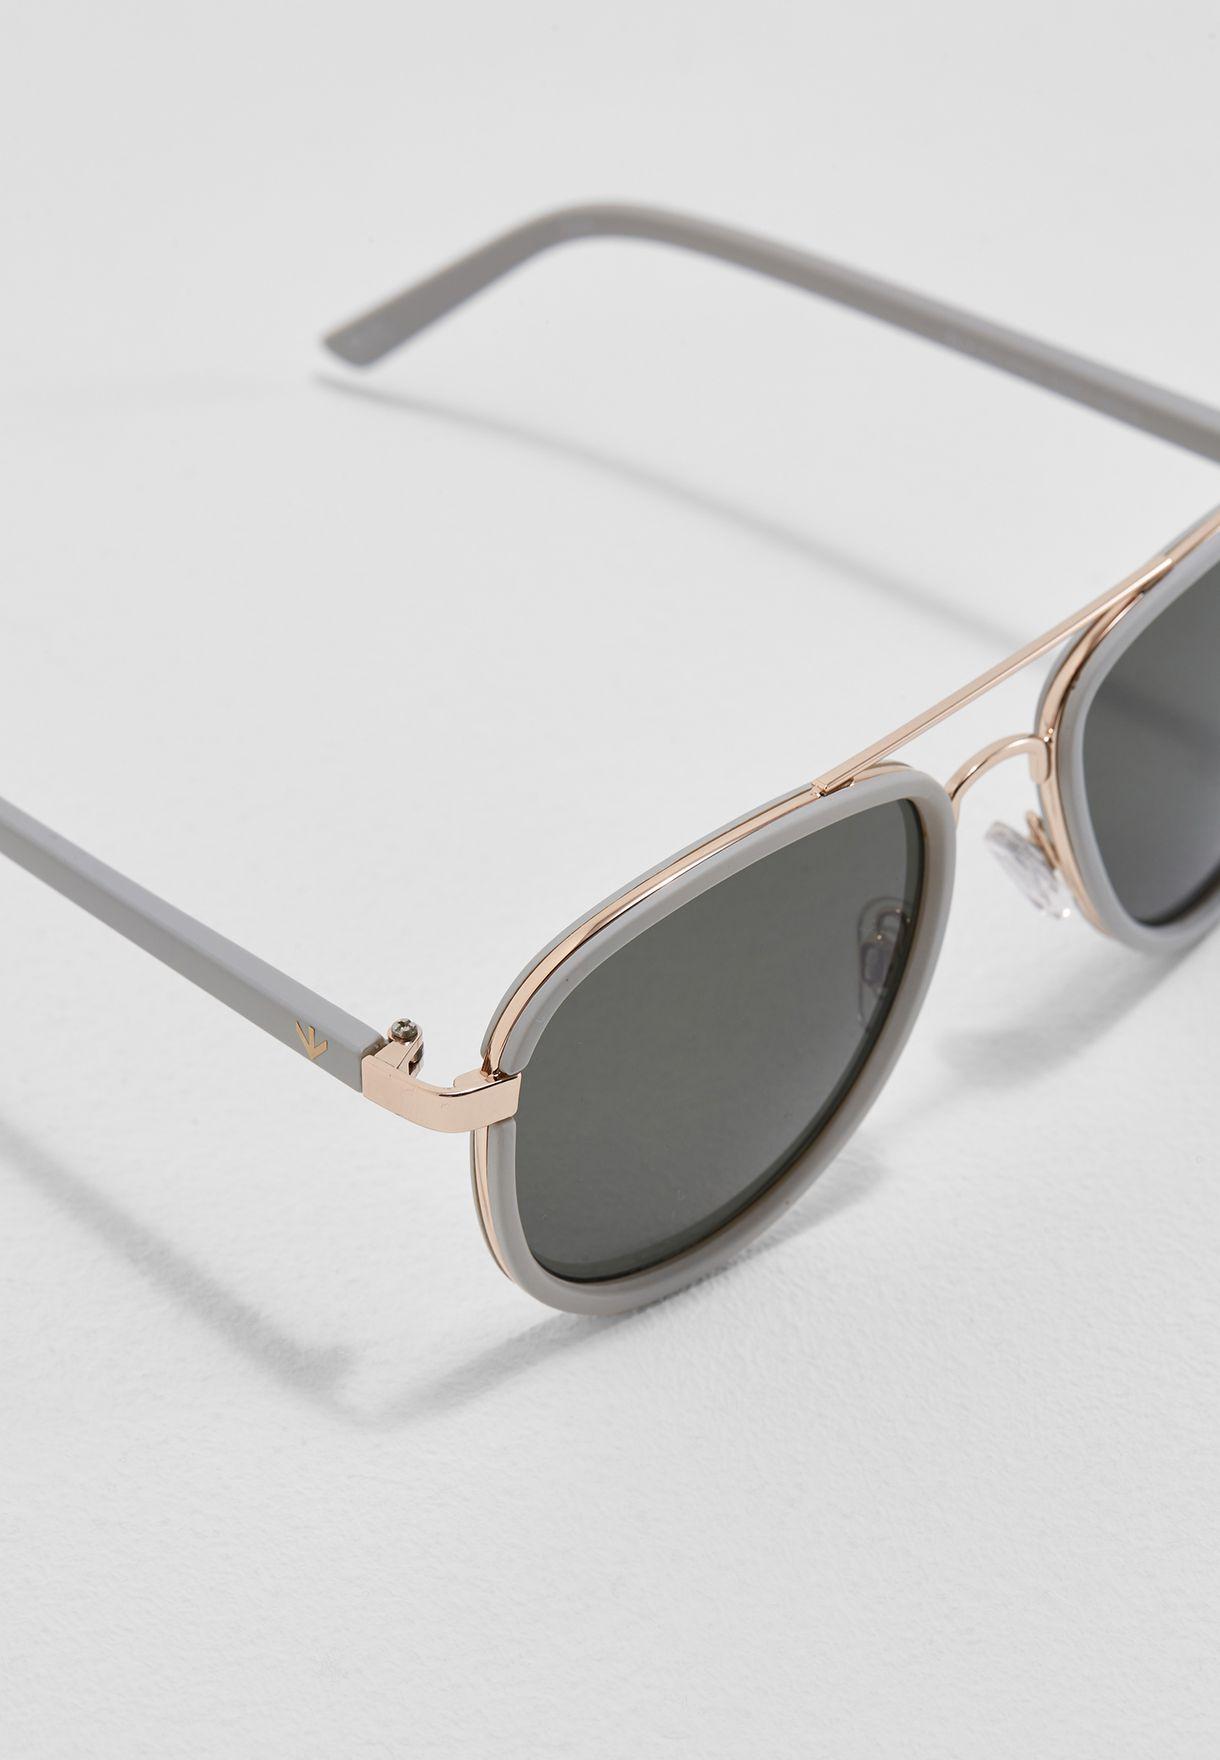 35bbd21fb تسوق نظارة شمسية فلاي ماركة توماس جيمس لوس انجلس لون أبيض Fly في ...